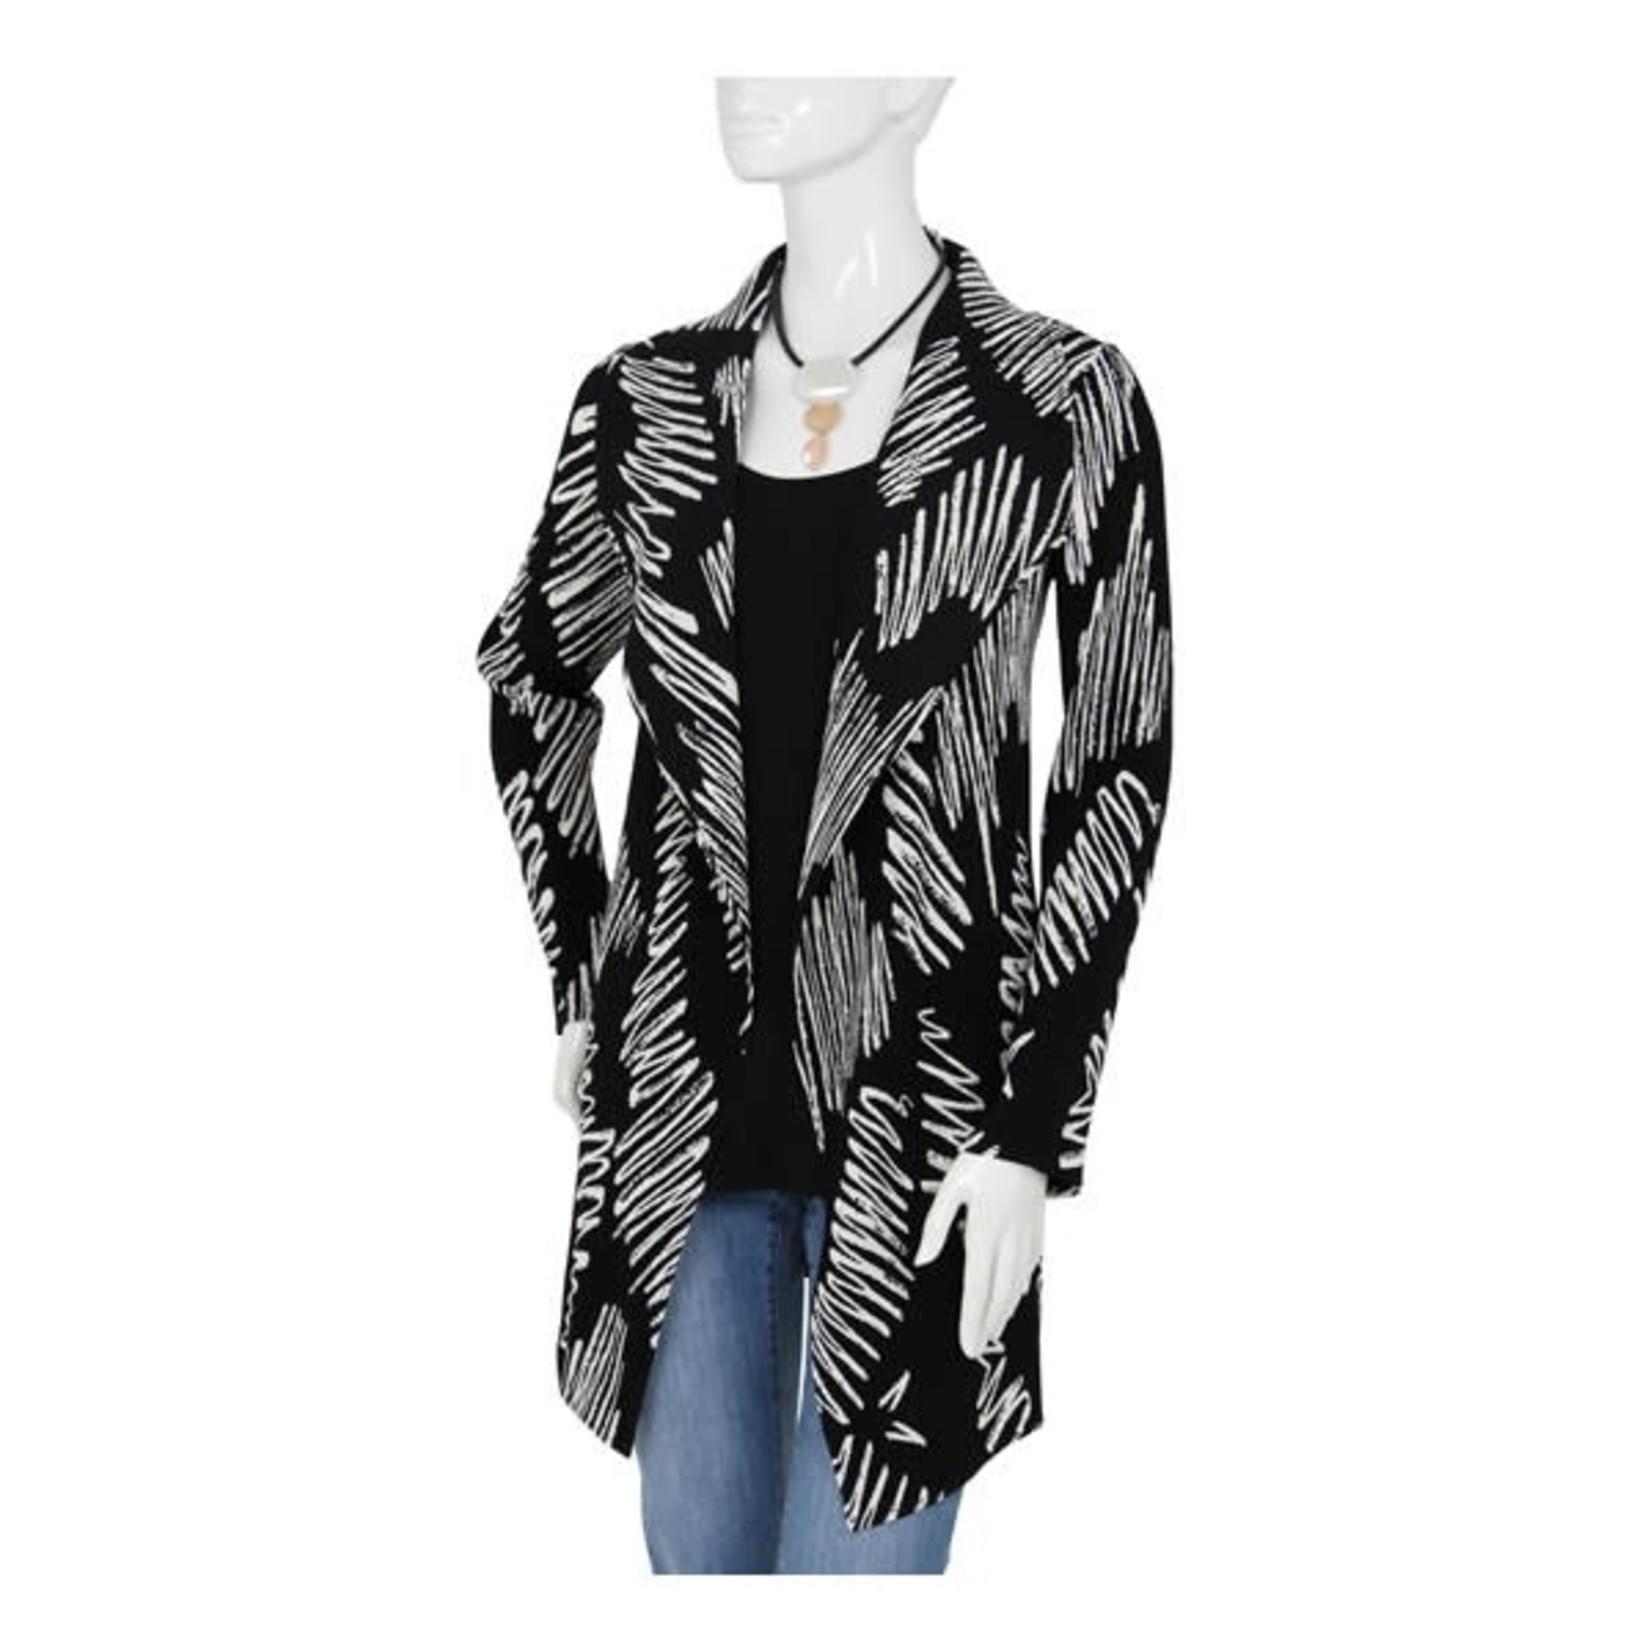 Black Crinkle Jacket w/ Off White Squiggles/No Closure